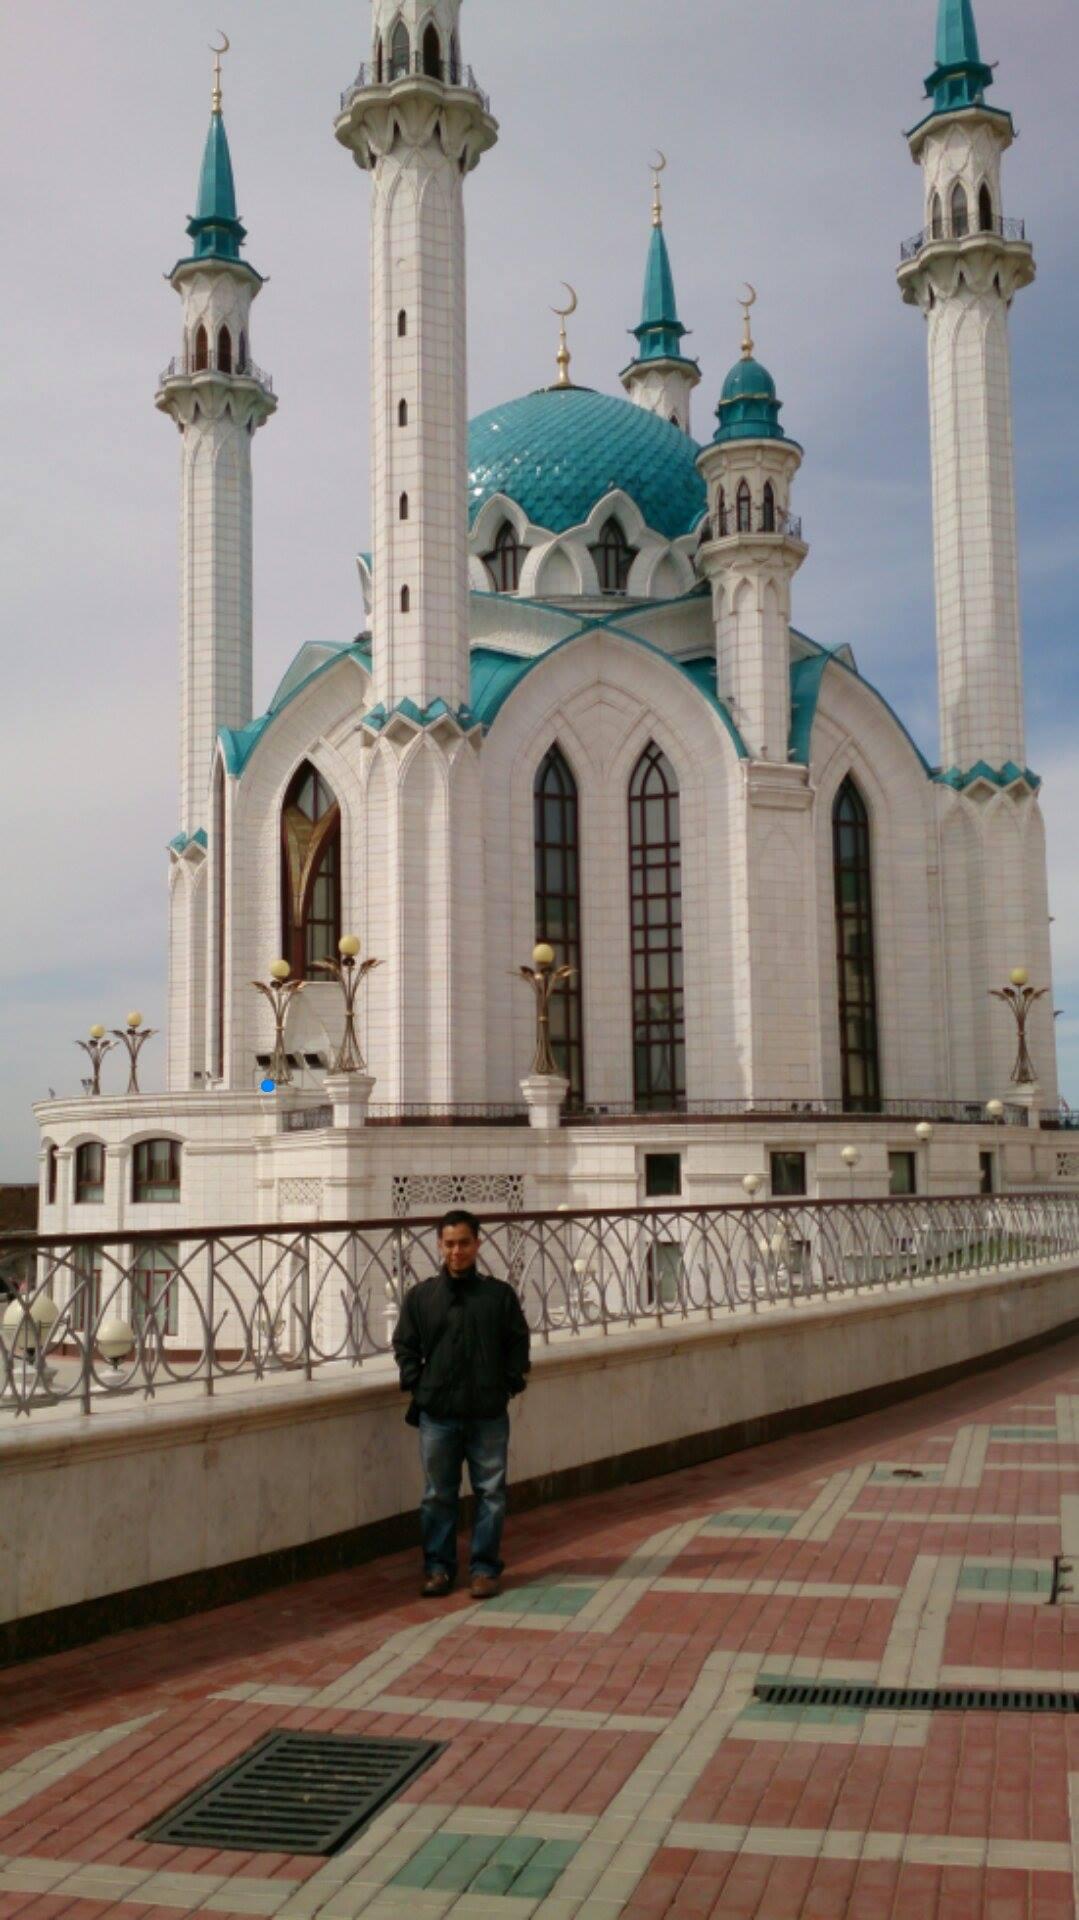 Di masjid kul Sharif, Kazan Rusia